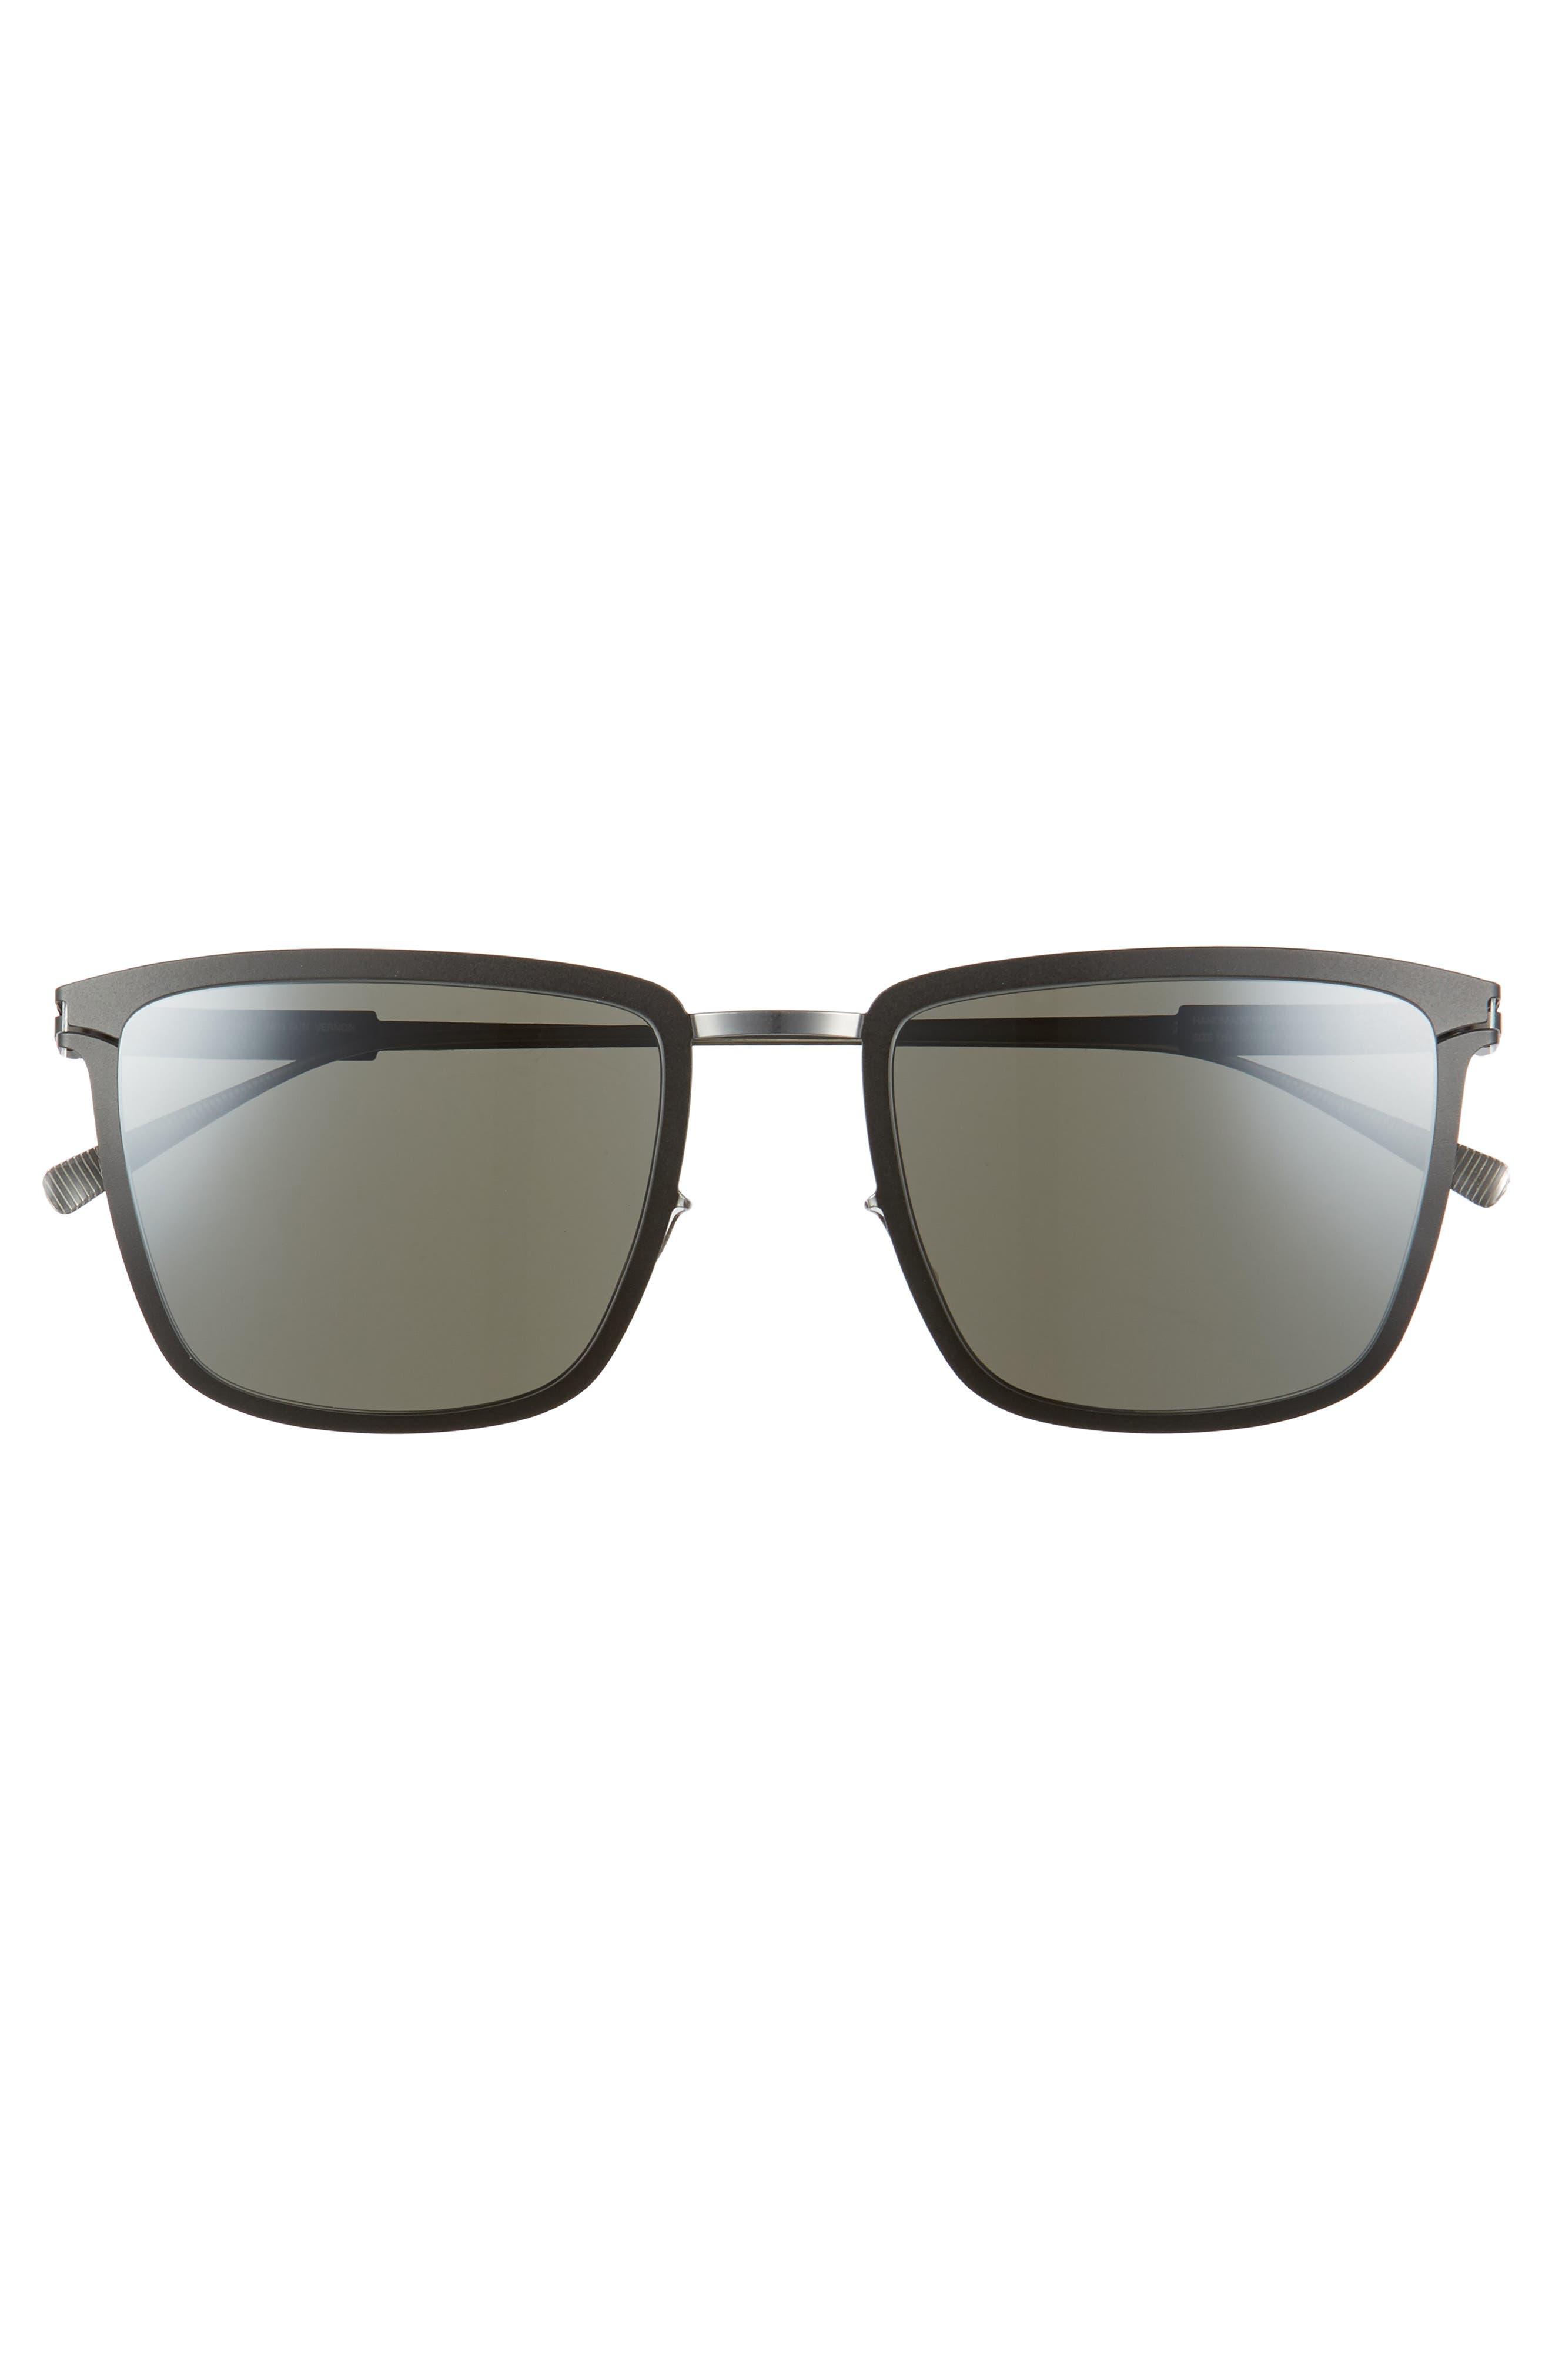 Vernon 54mm Mirrored Sunglasses,                             Alternate thumbnail 2, color,                             Silver/ Black